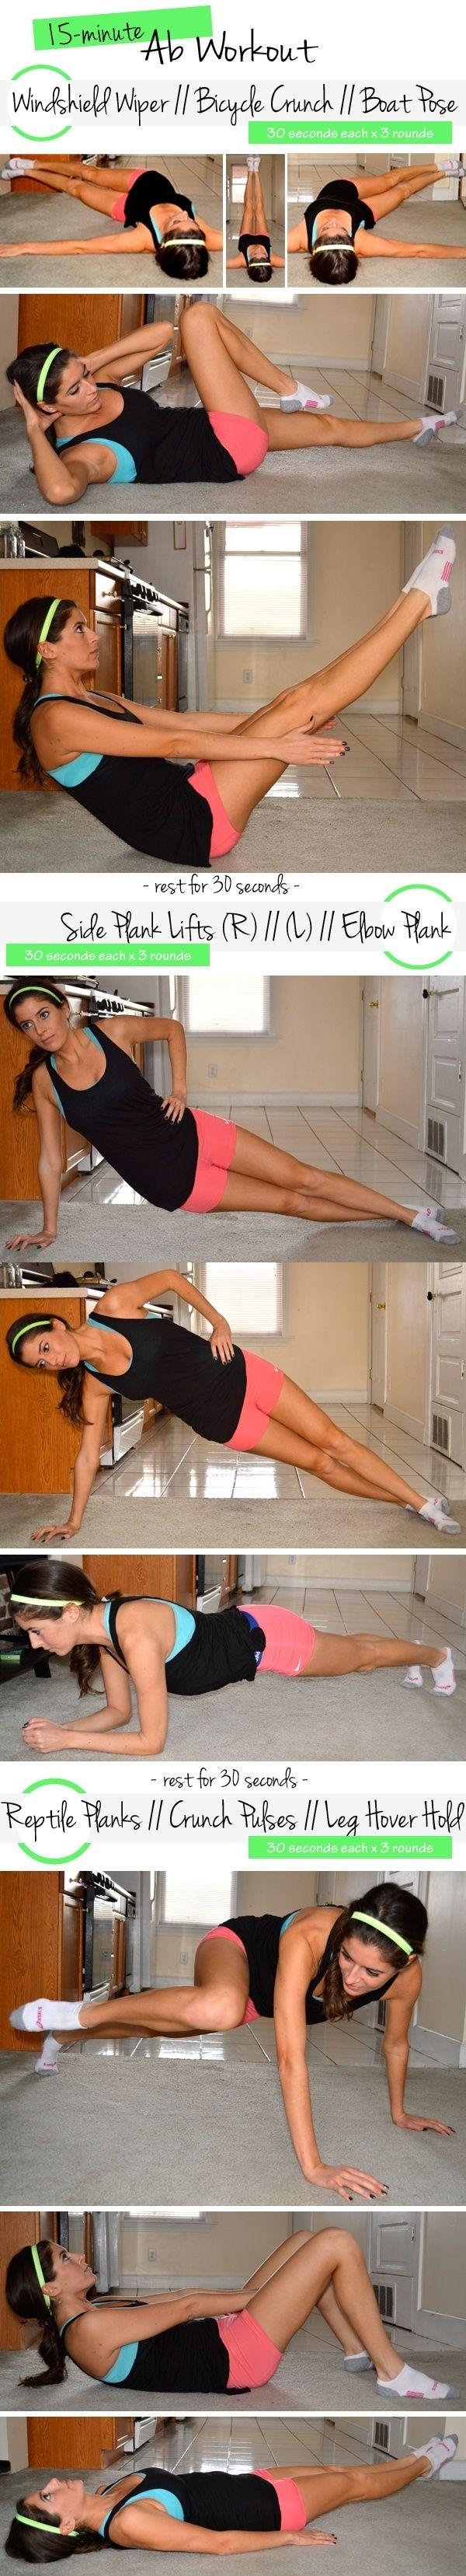 Workout Diagrams